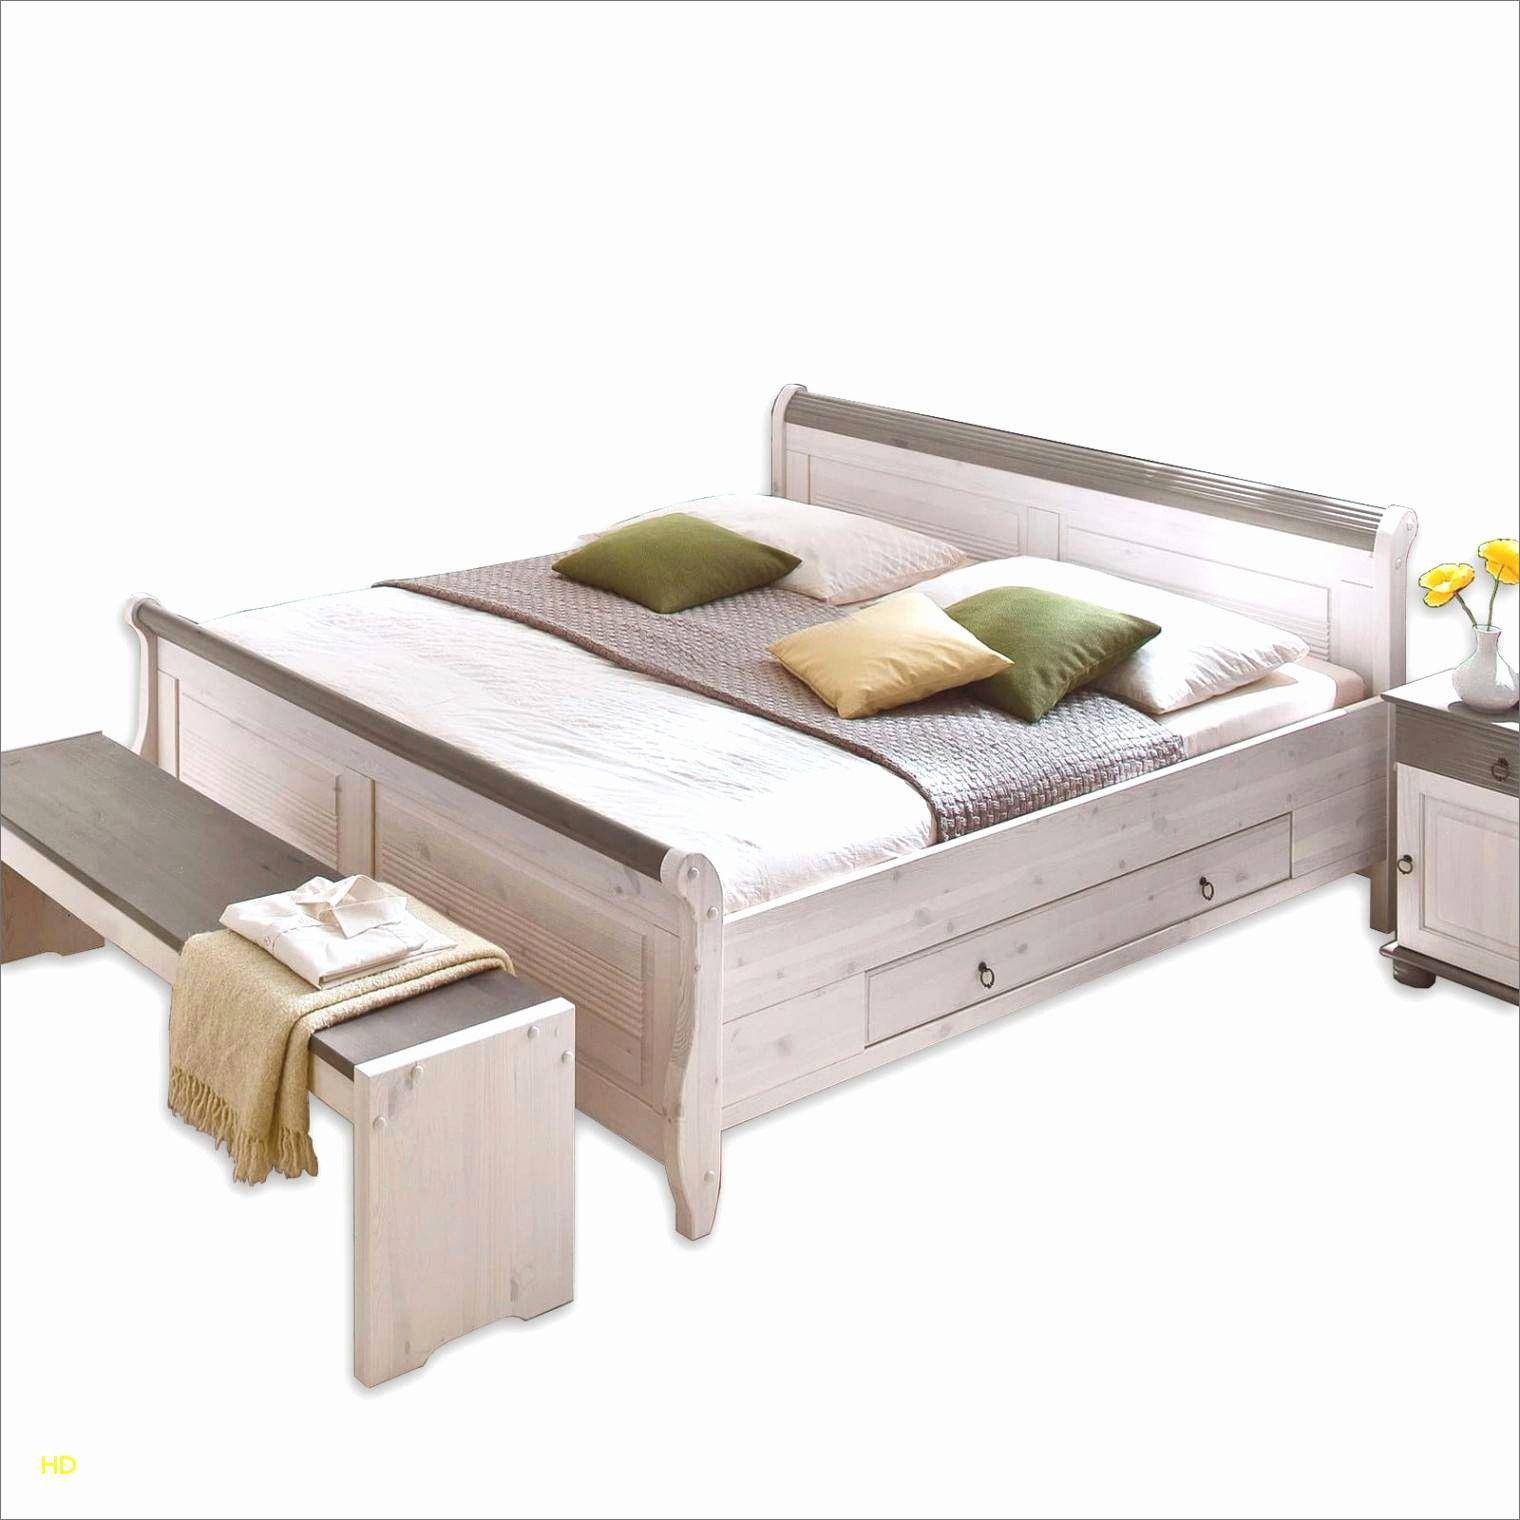 50 Elegante Bett 140 200 Boxspringbett La Photographie In 2020 Bed Bedroom Design